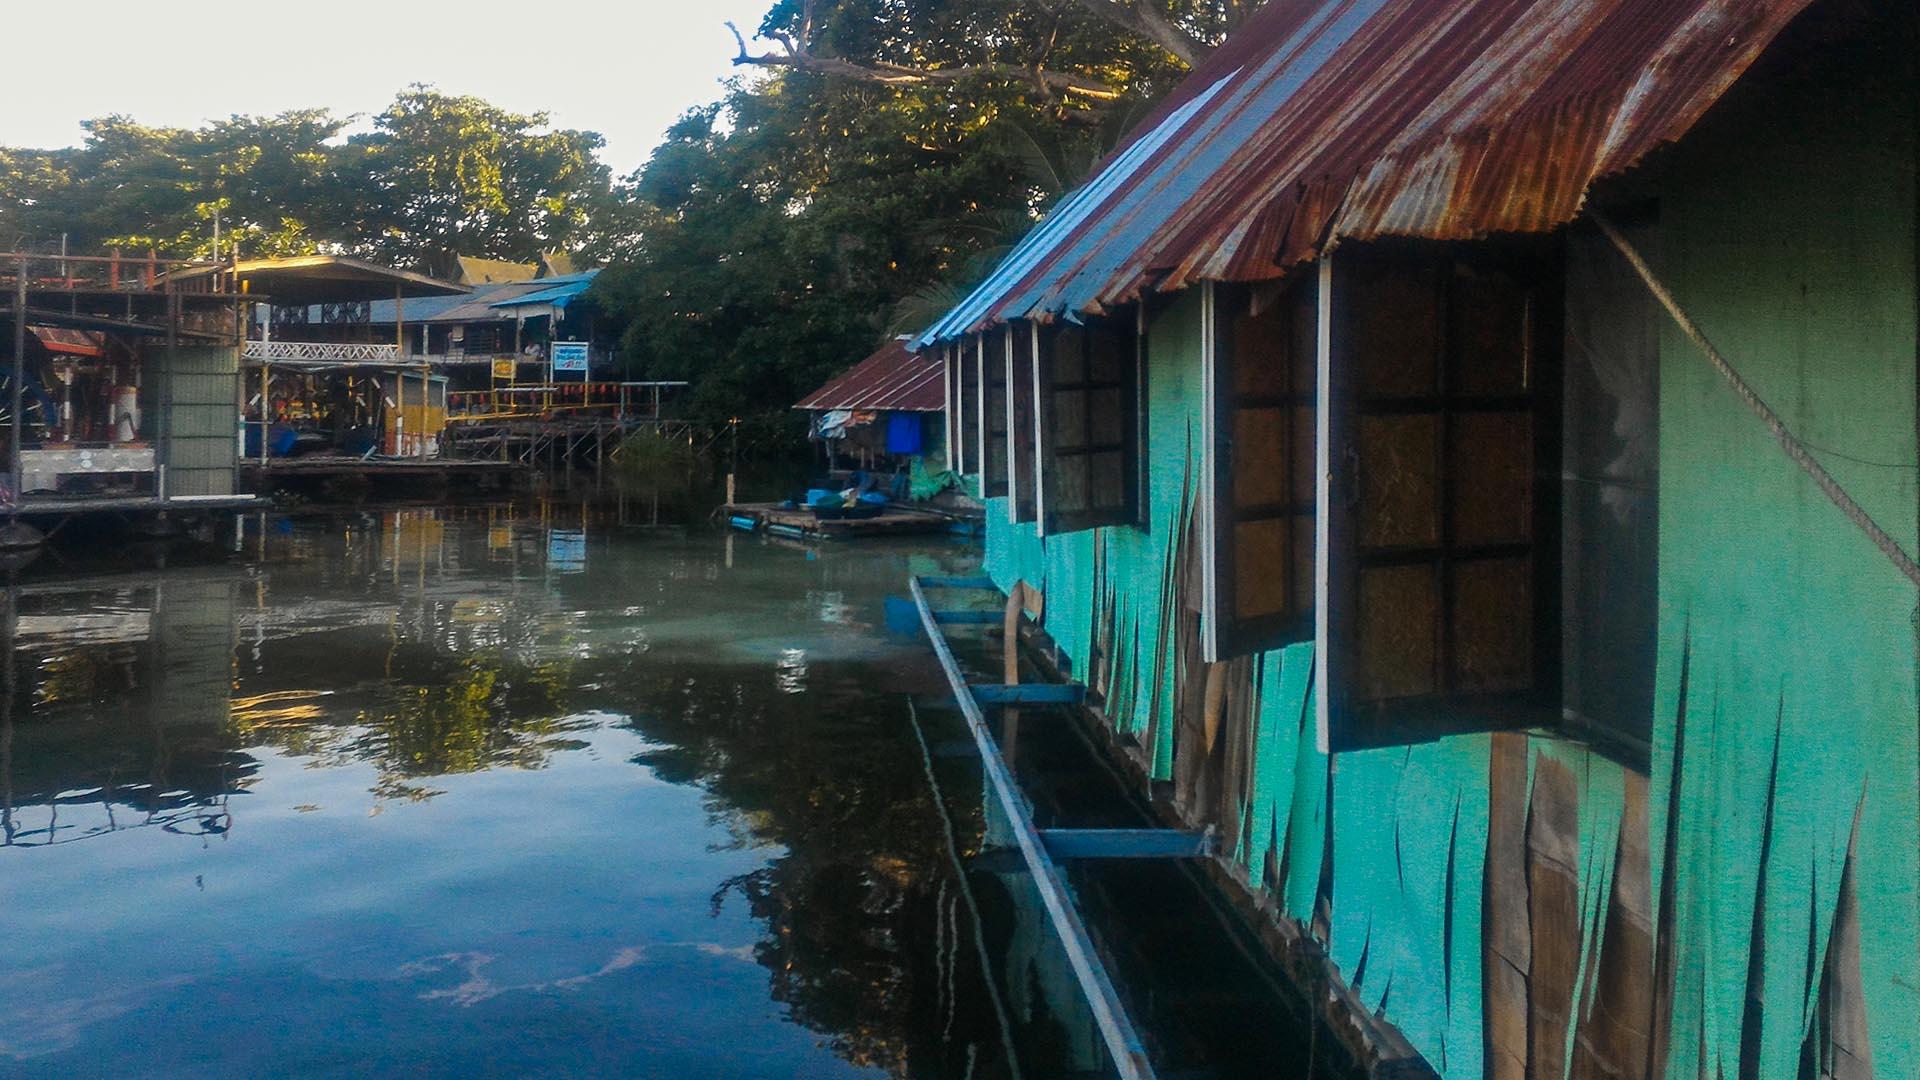 Nita Raft House